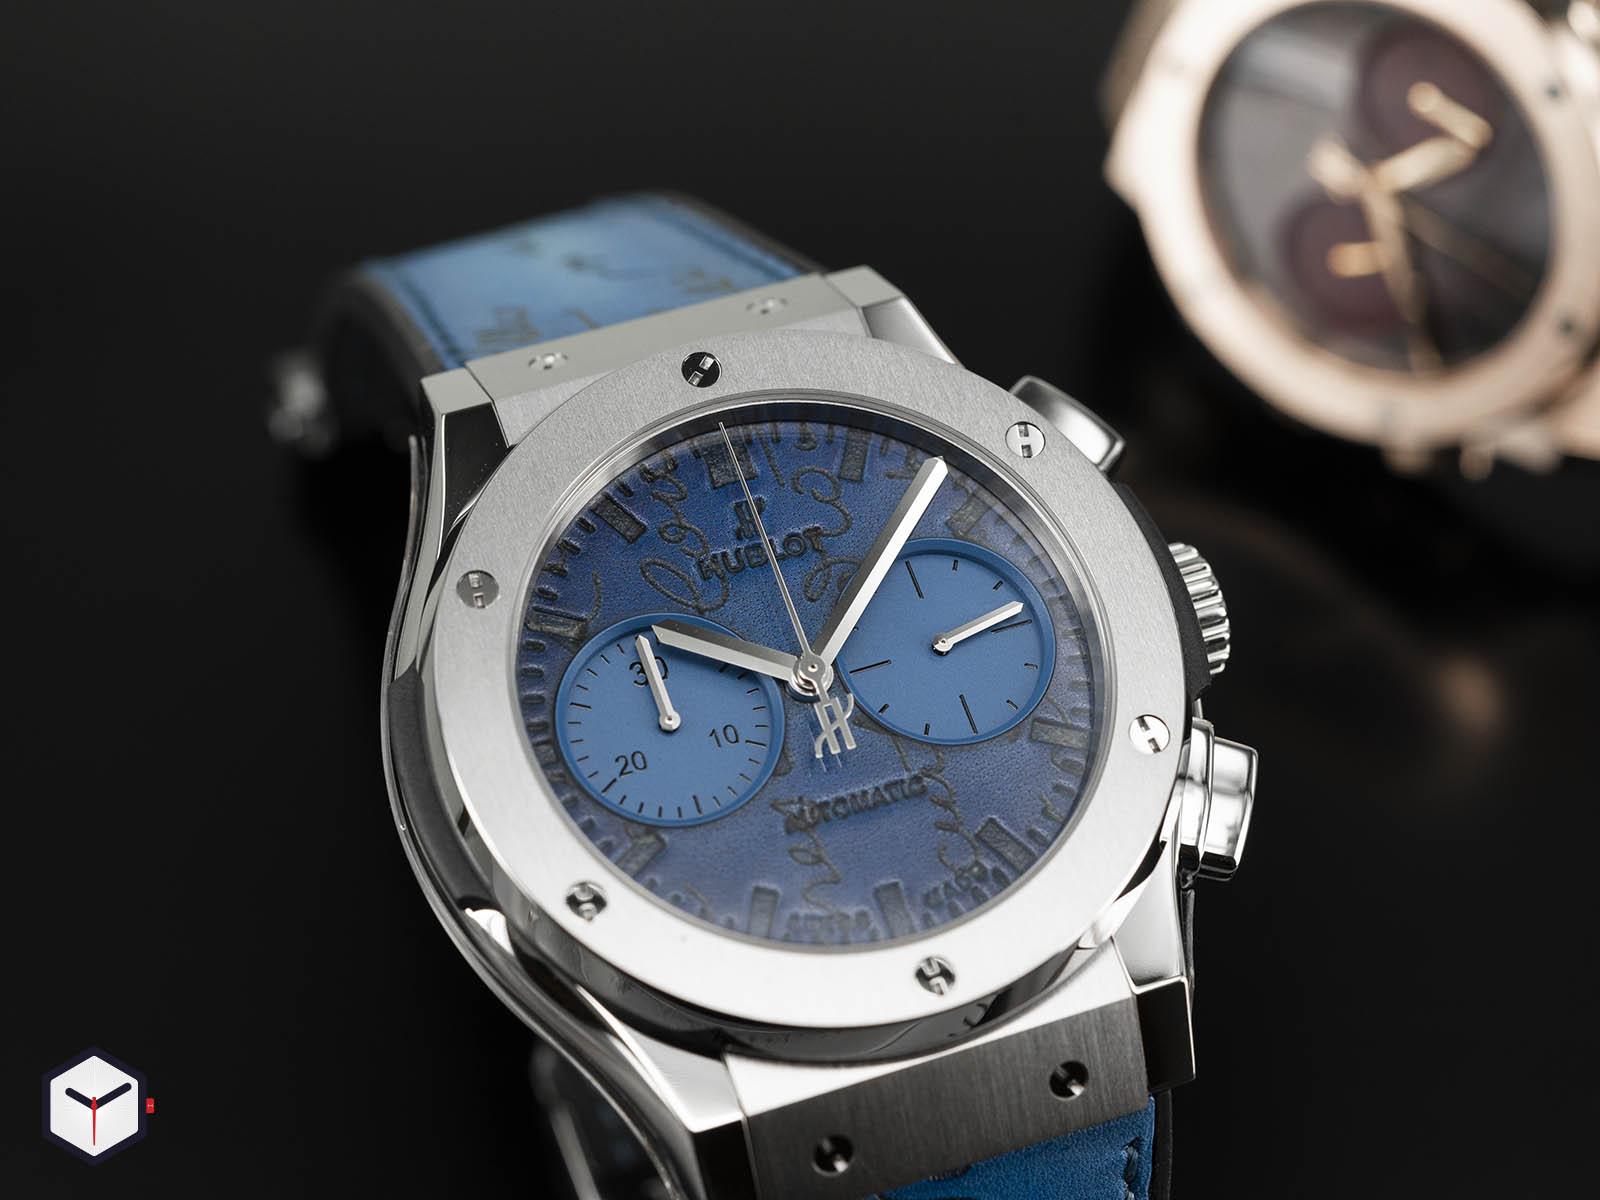 521-nx-050b-vr-ber18-hublot-classic-fusion-chronograph-berluti-scritto-ocean-blue-45mm-1.jpg